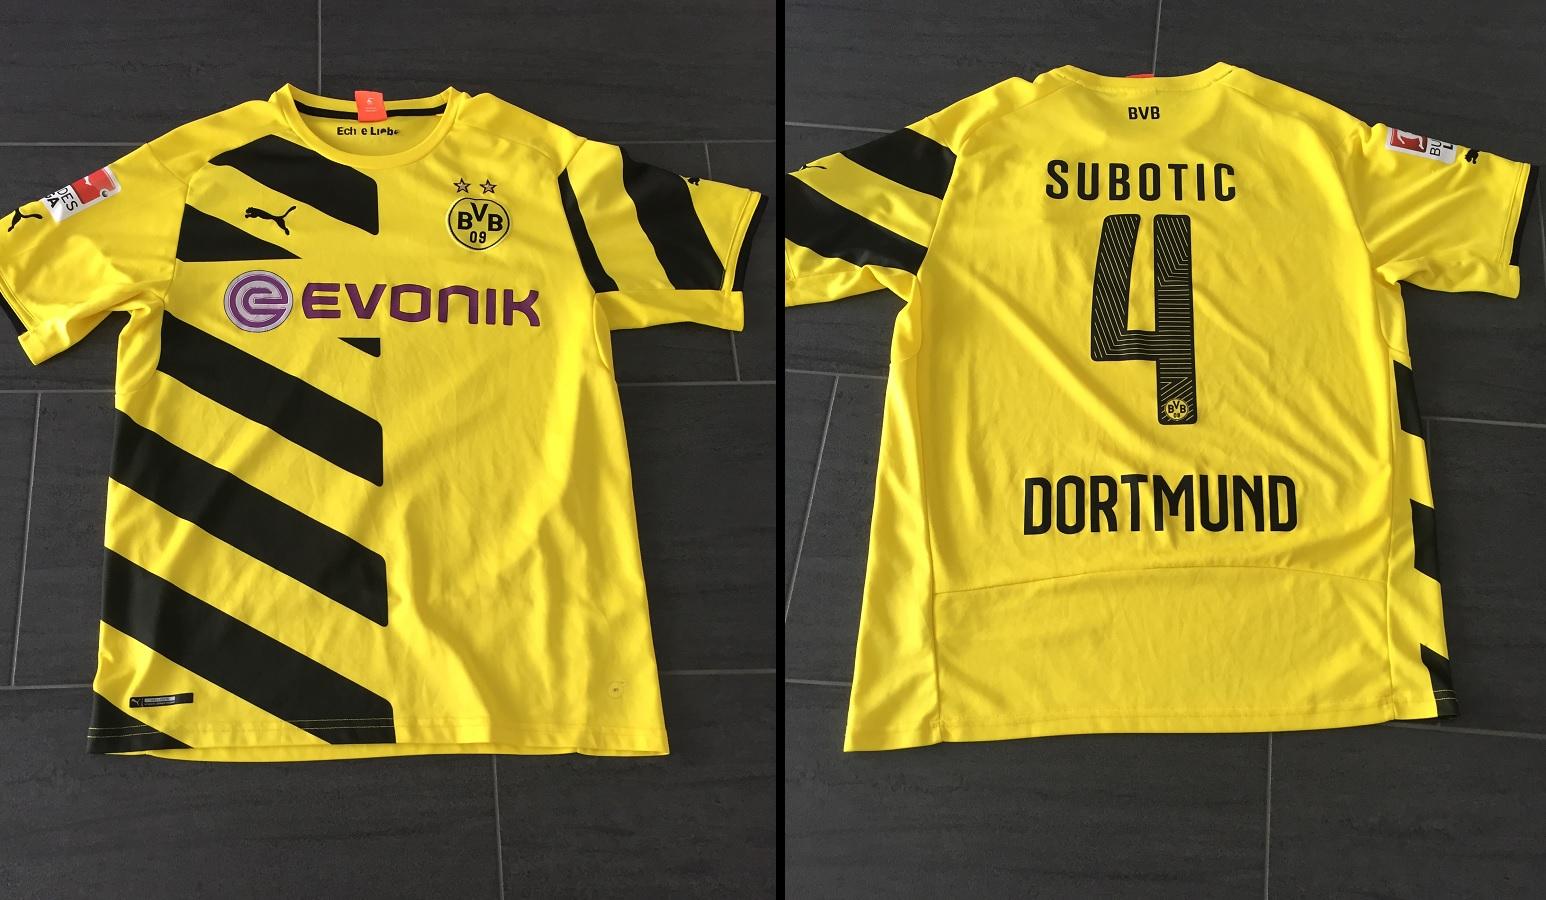 Borussia Dortmund Home 2014/15 Subotic